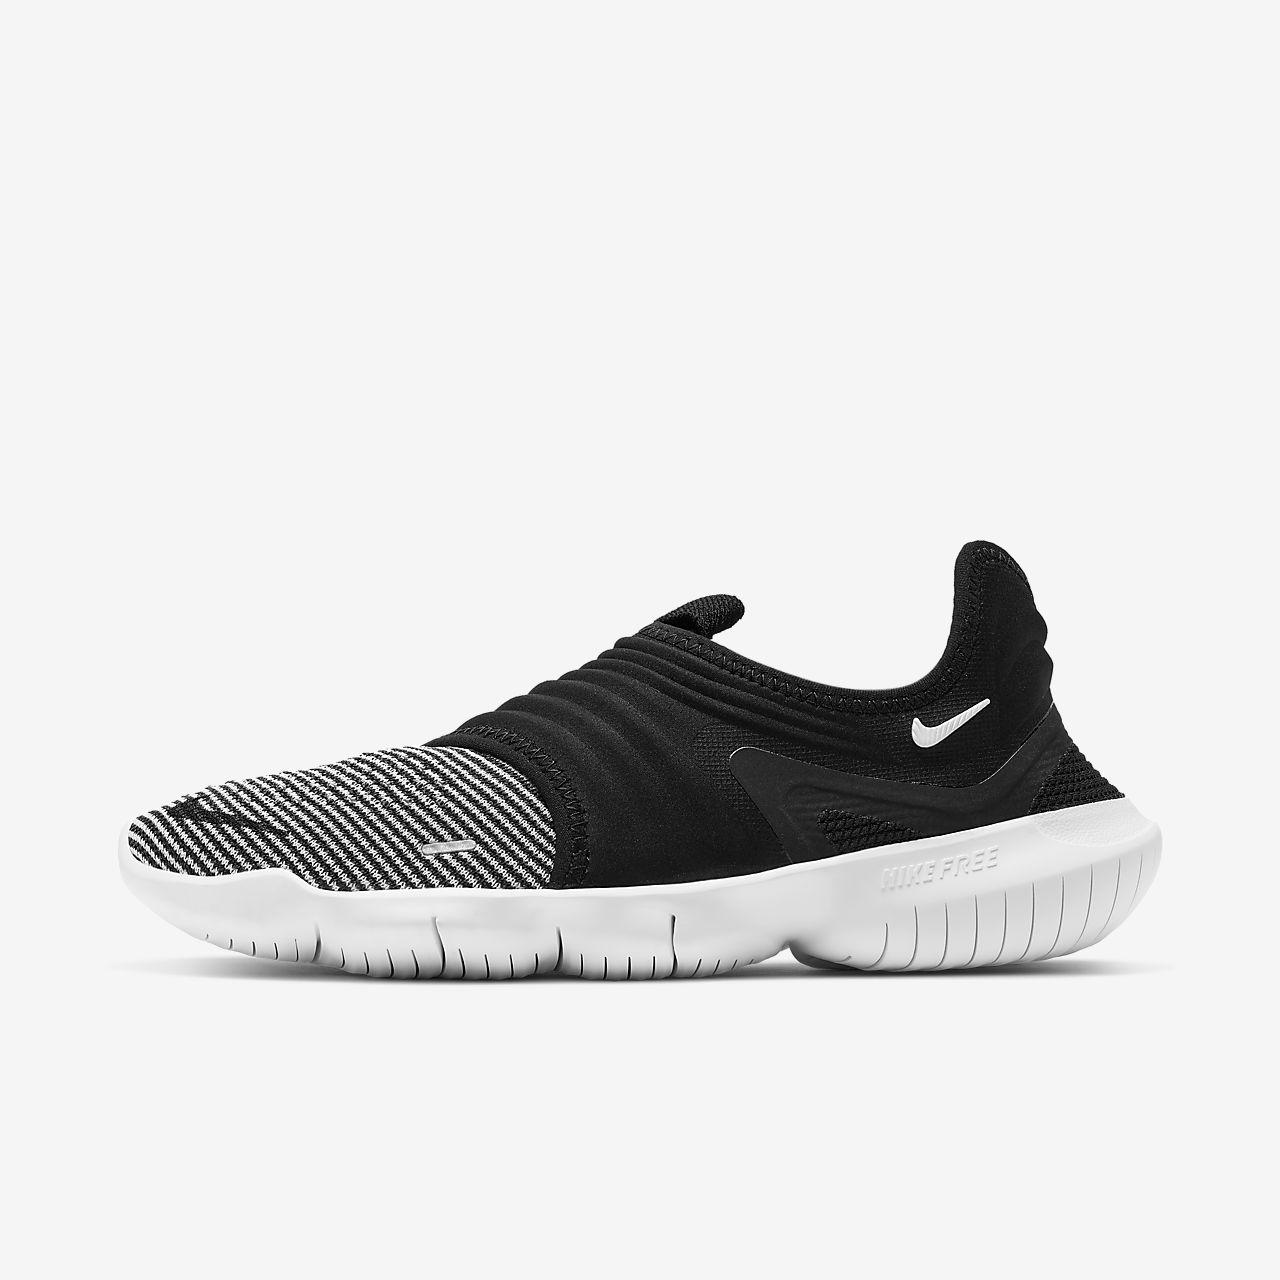 Nike Free RN Flyknit 3.0 Damen-Laufschuh